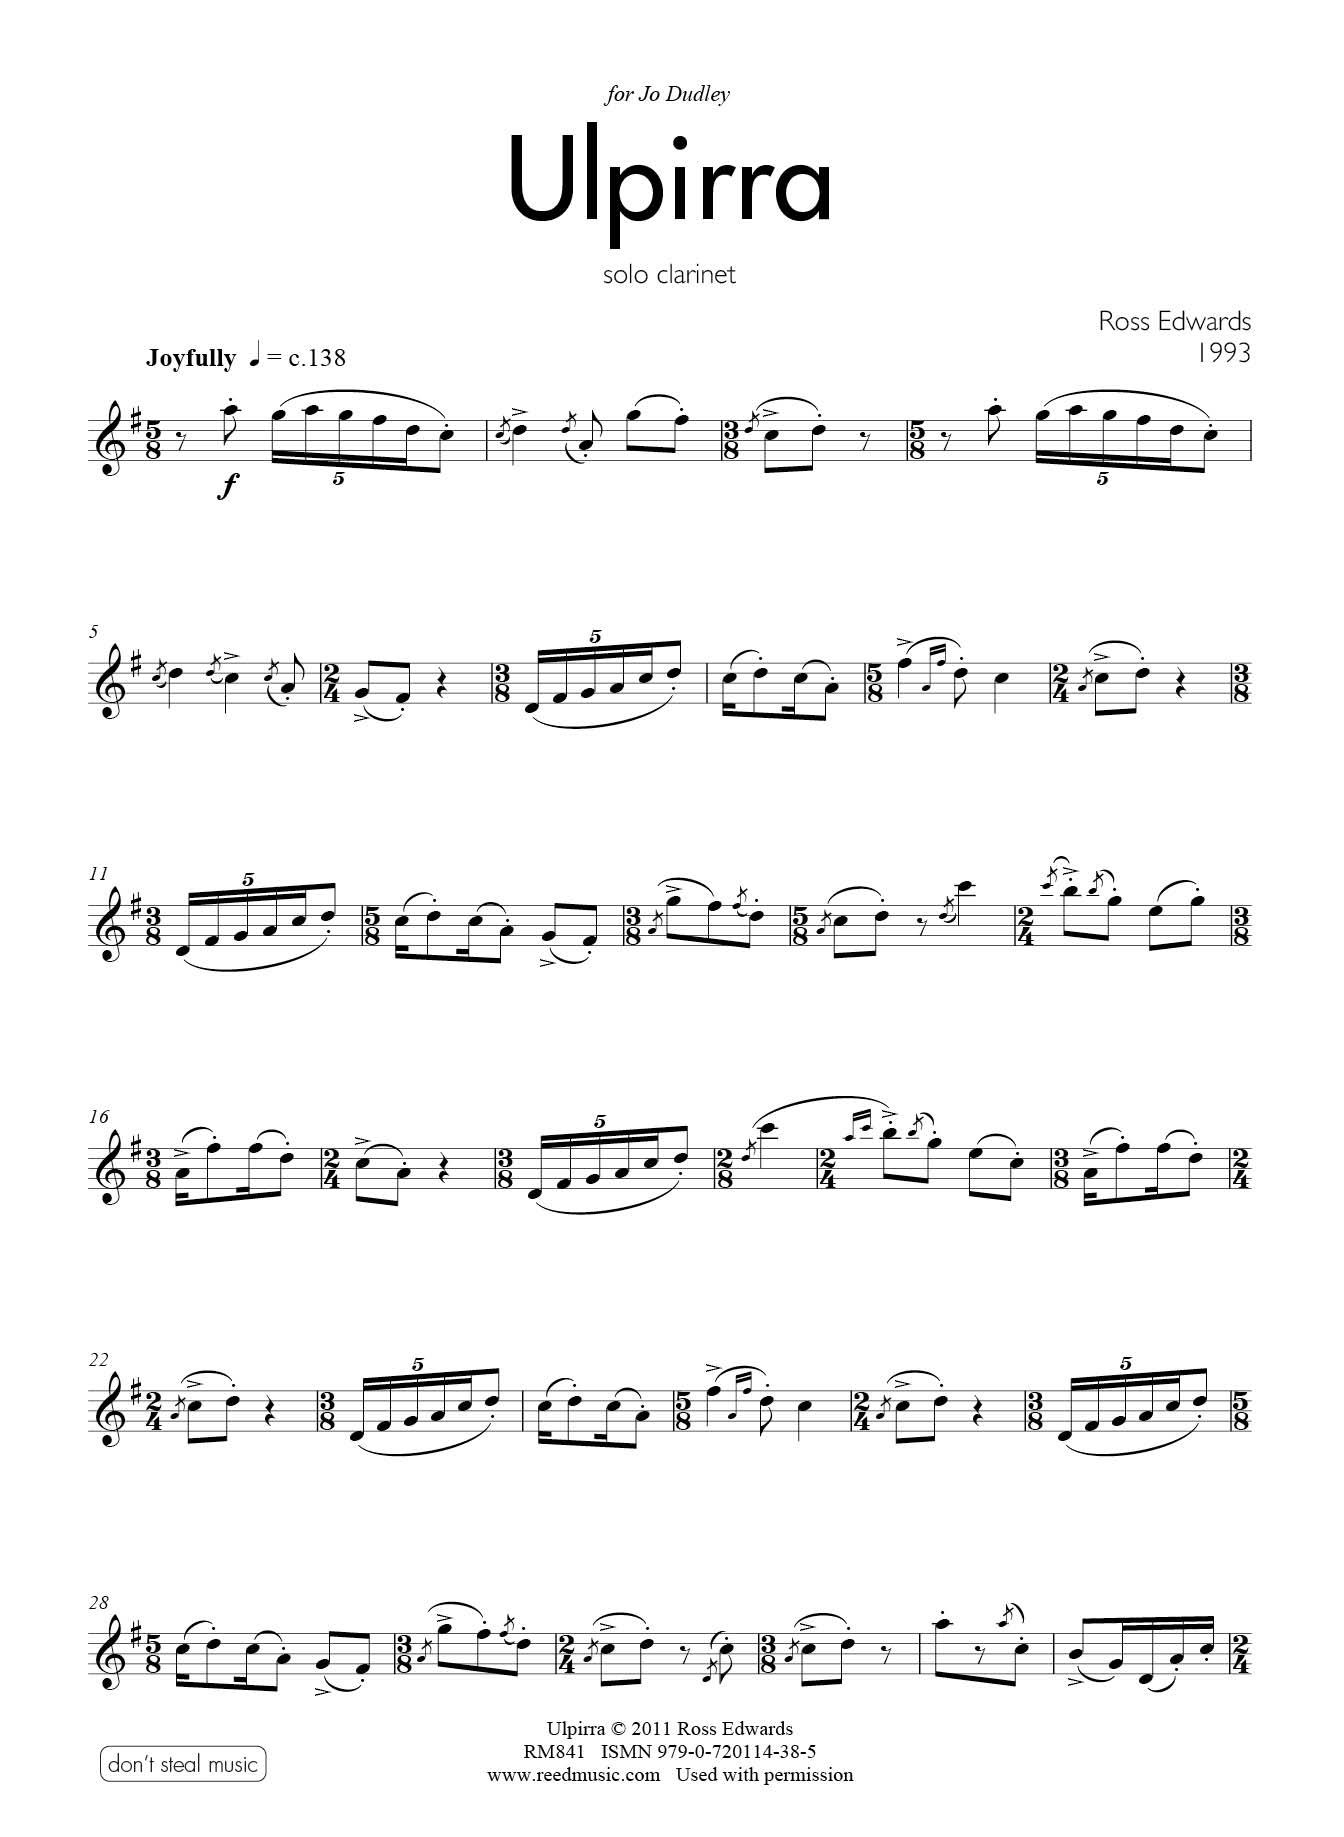 B Flat Clarinet Music For Beginners The Australian recorder player